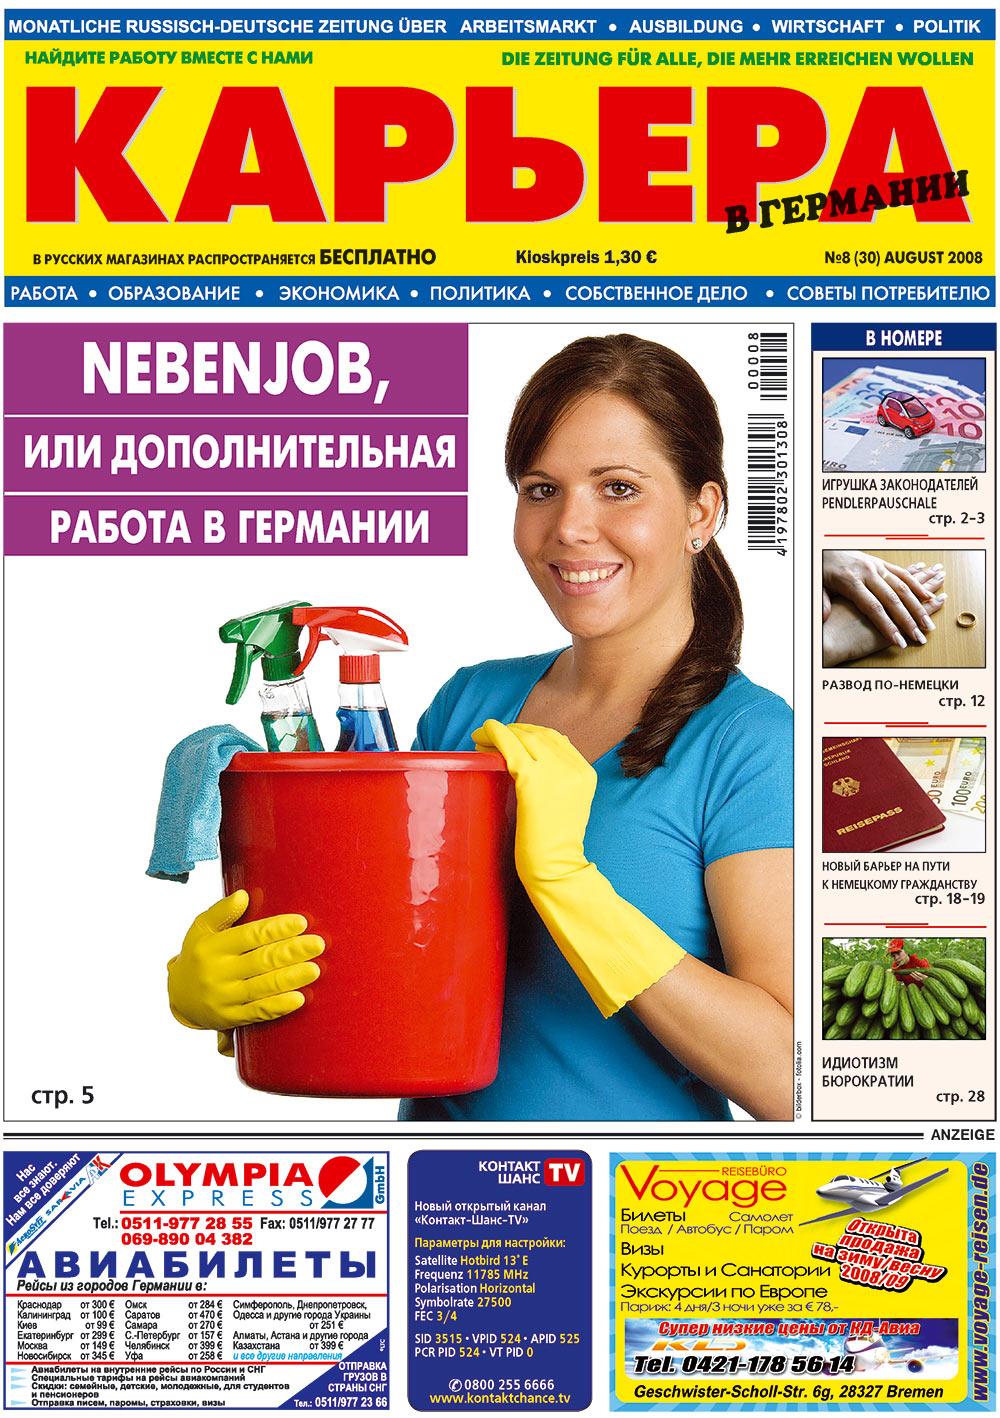 Карьера (газета). 2008 год, номер 8, стр. 1